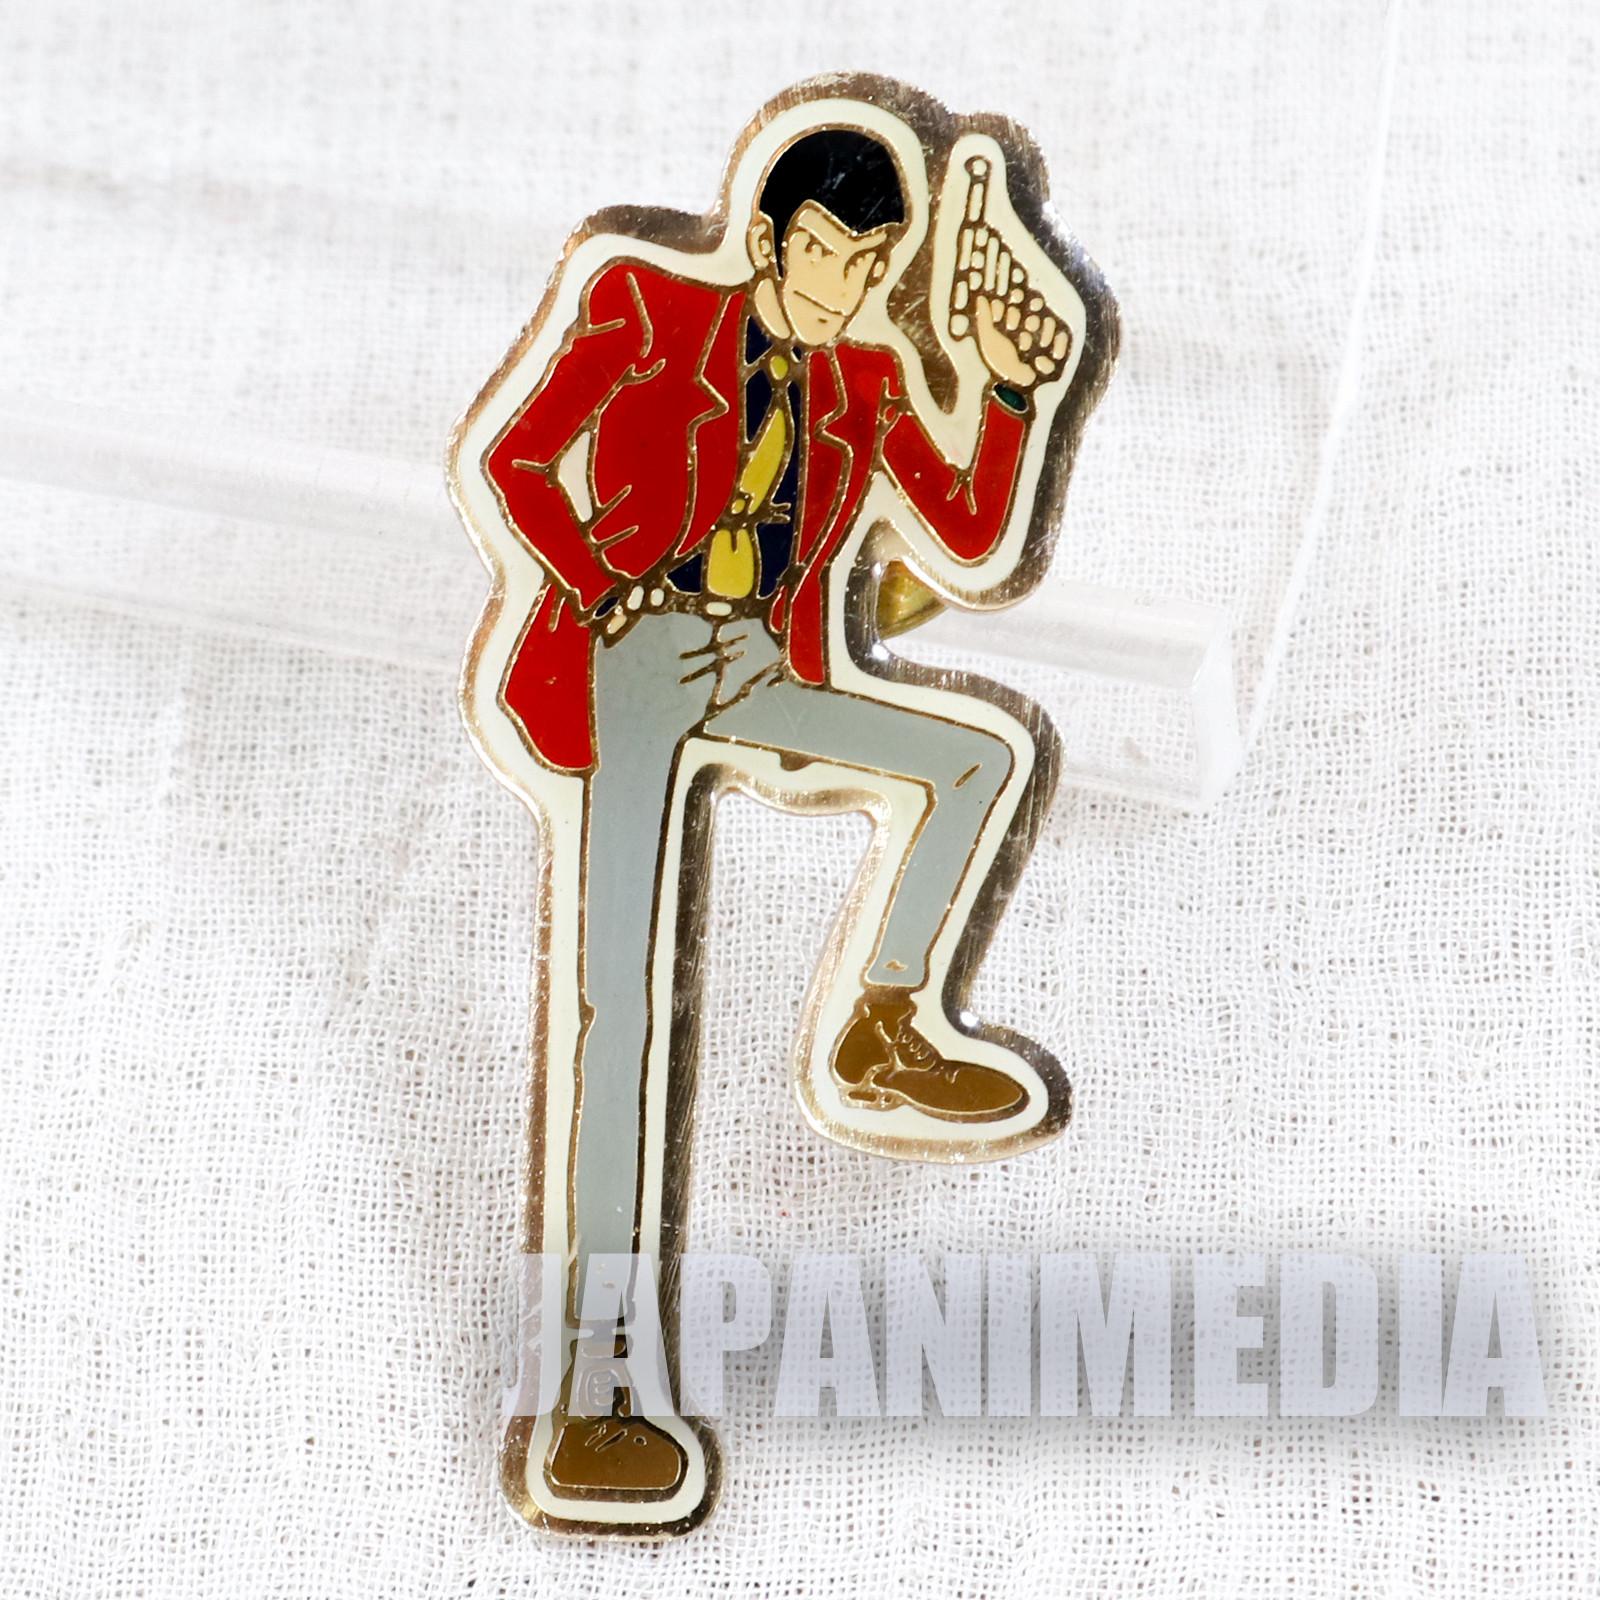 Lupin the Third (3rd) Metal Pins #2 JAPAN ANIME